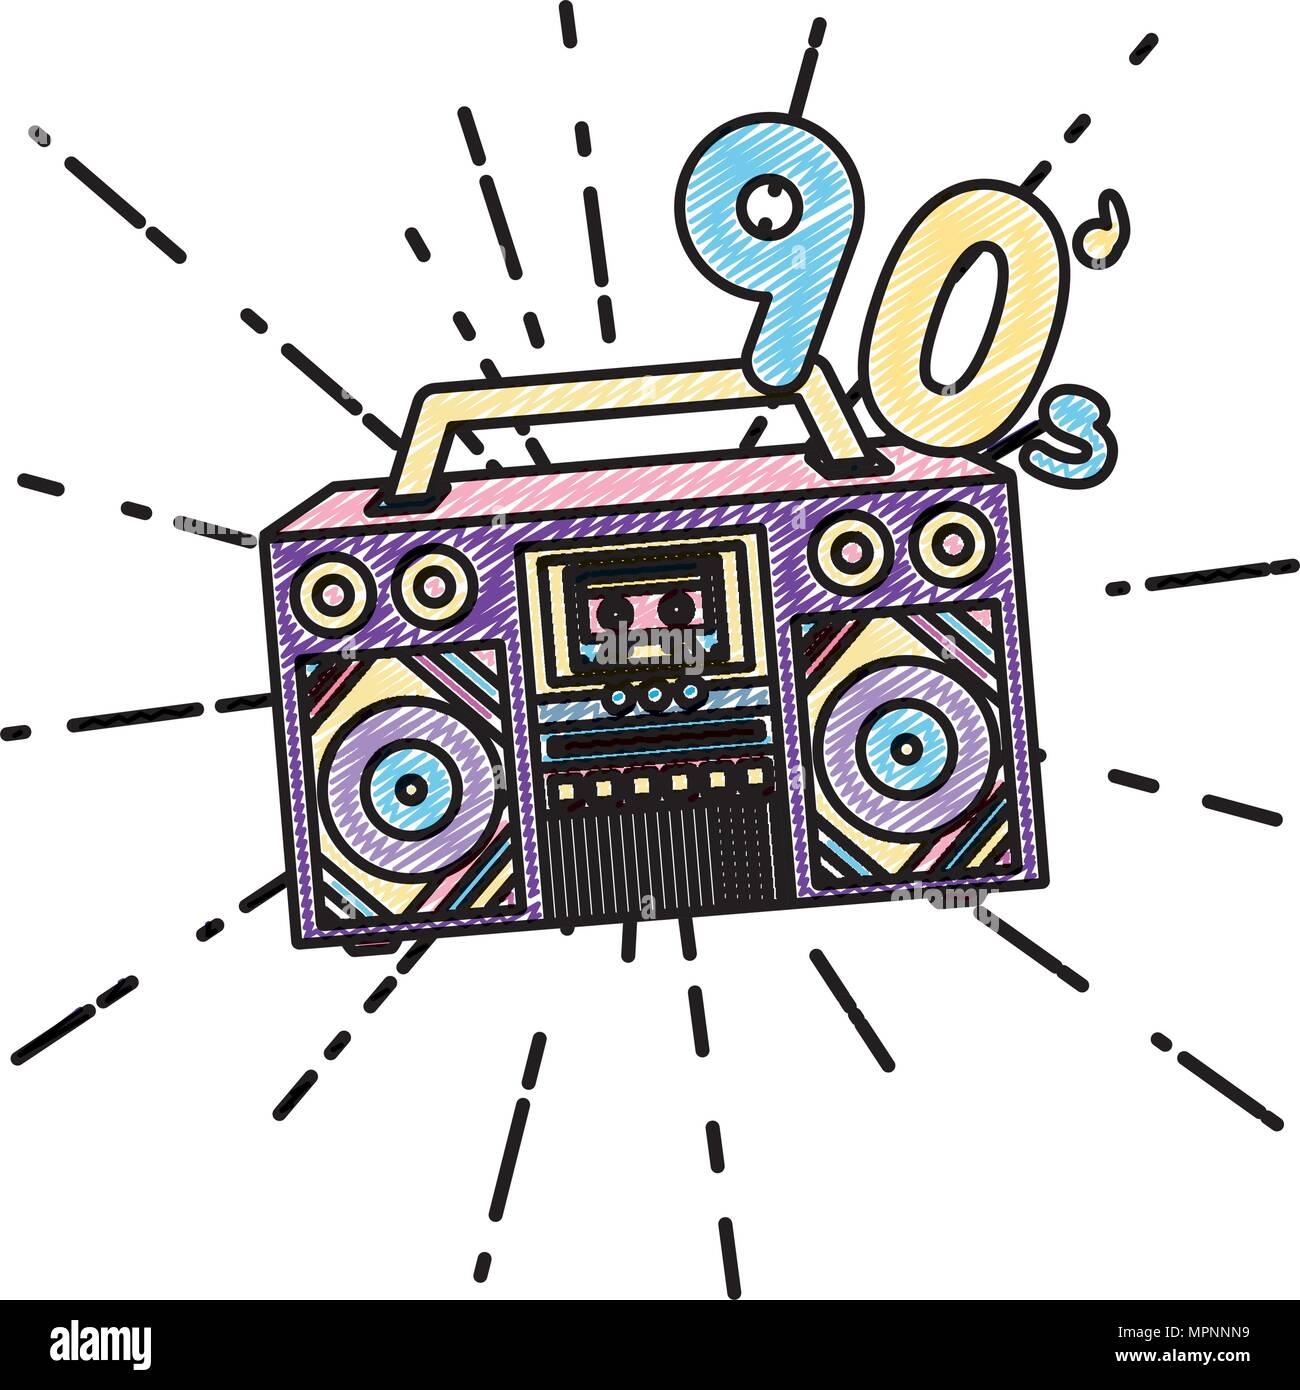 doodle retro radio music 90 trendy music vector illustration Stock Vector